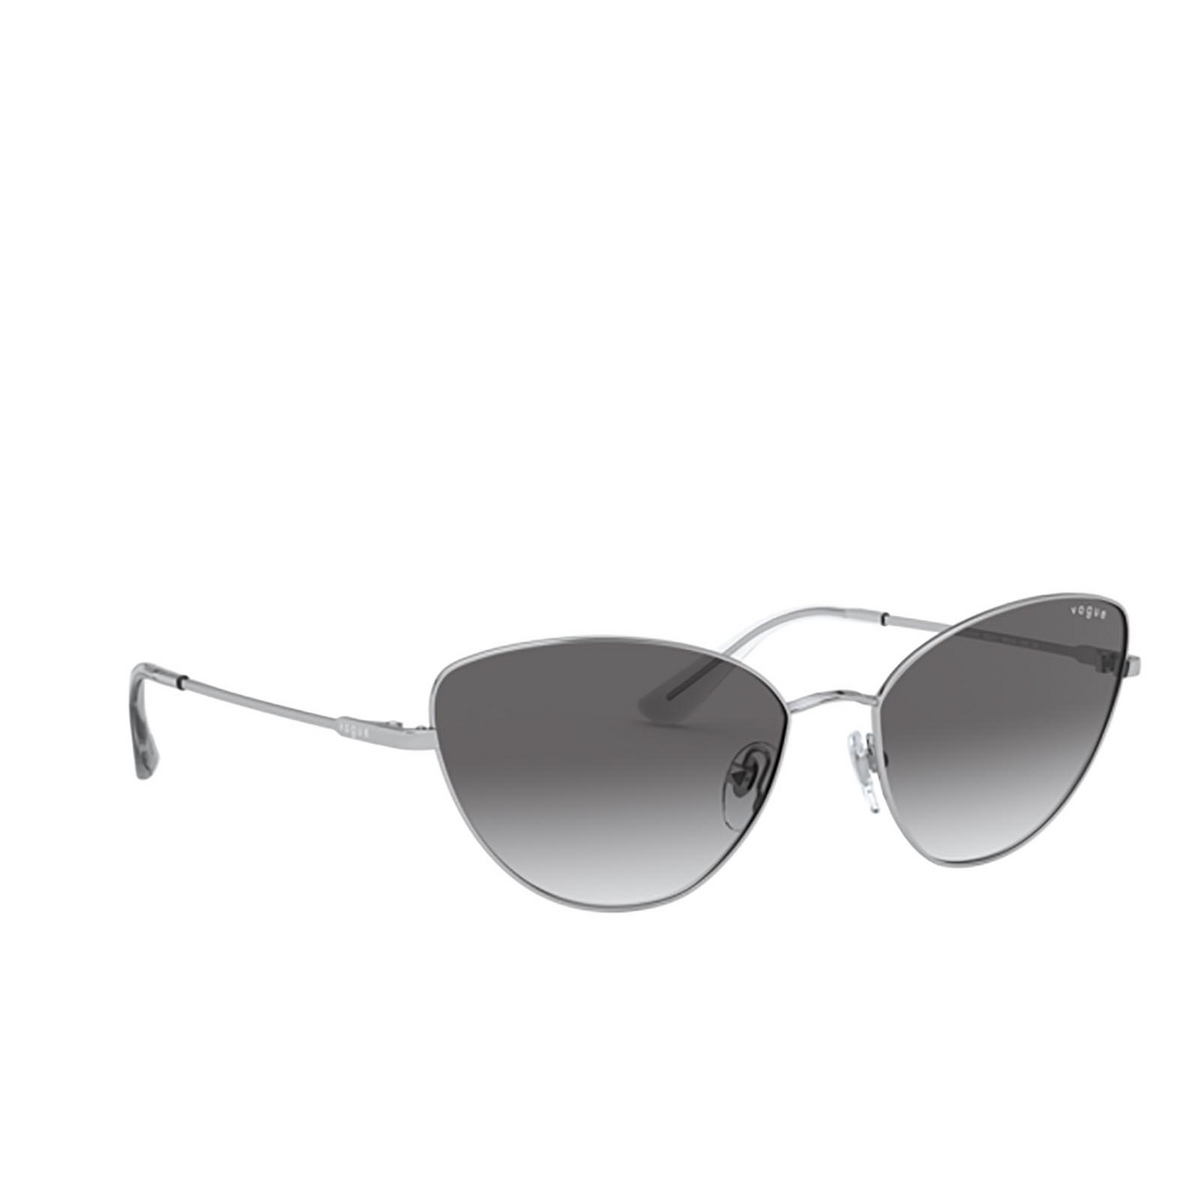 Vogue® Cat-eye Sunglasses: VO4179S color Silver 323/11 - three-quarters view.